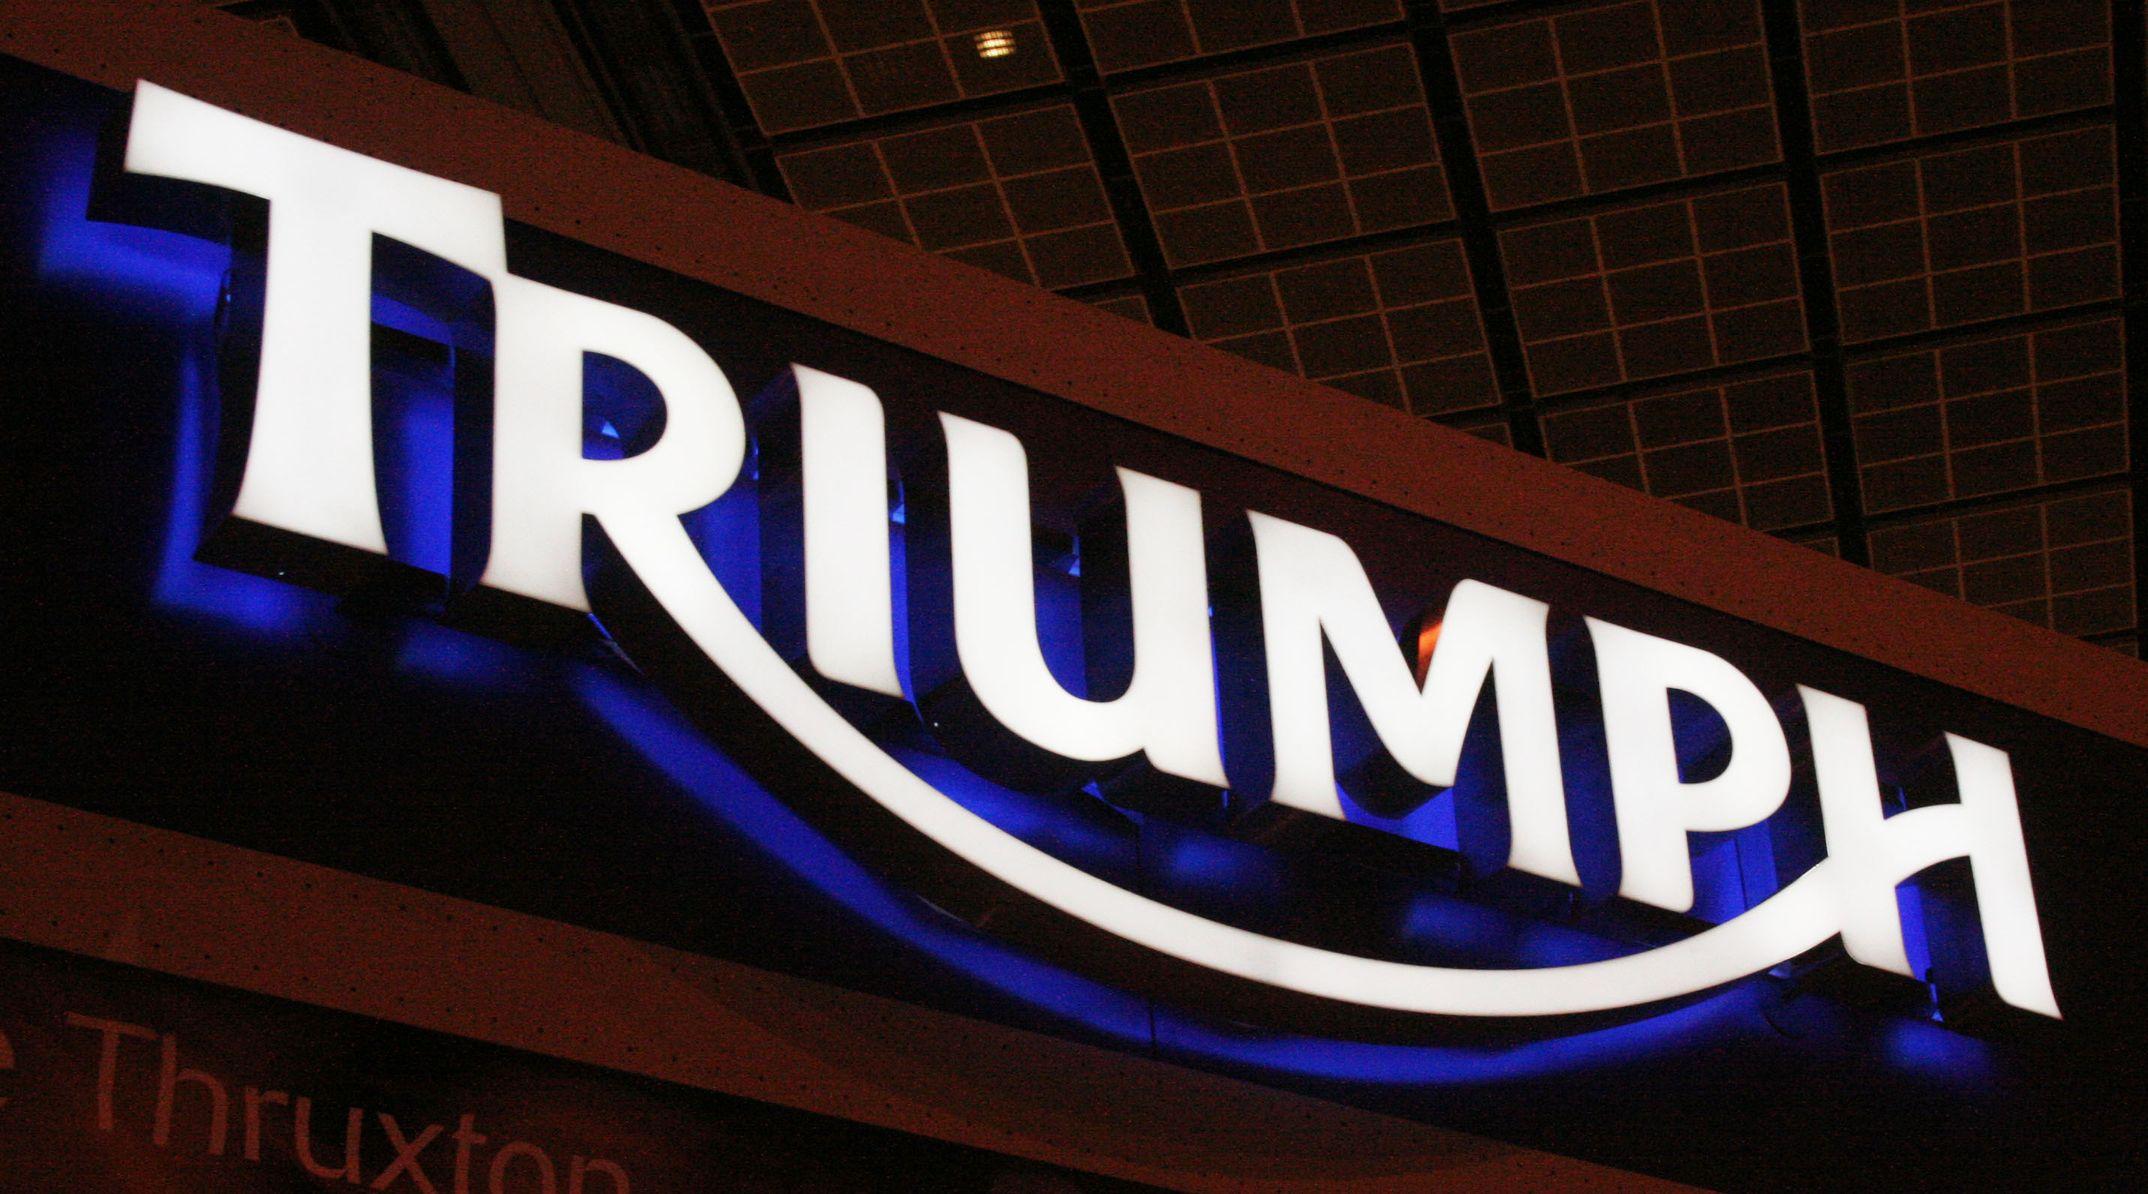 Triumph Logo - Bing images